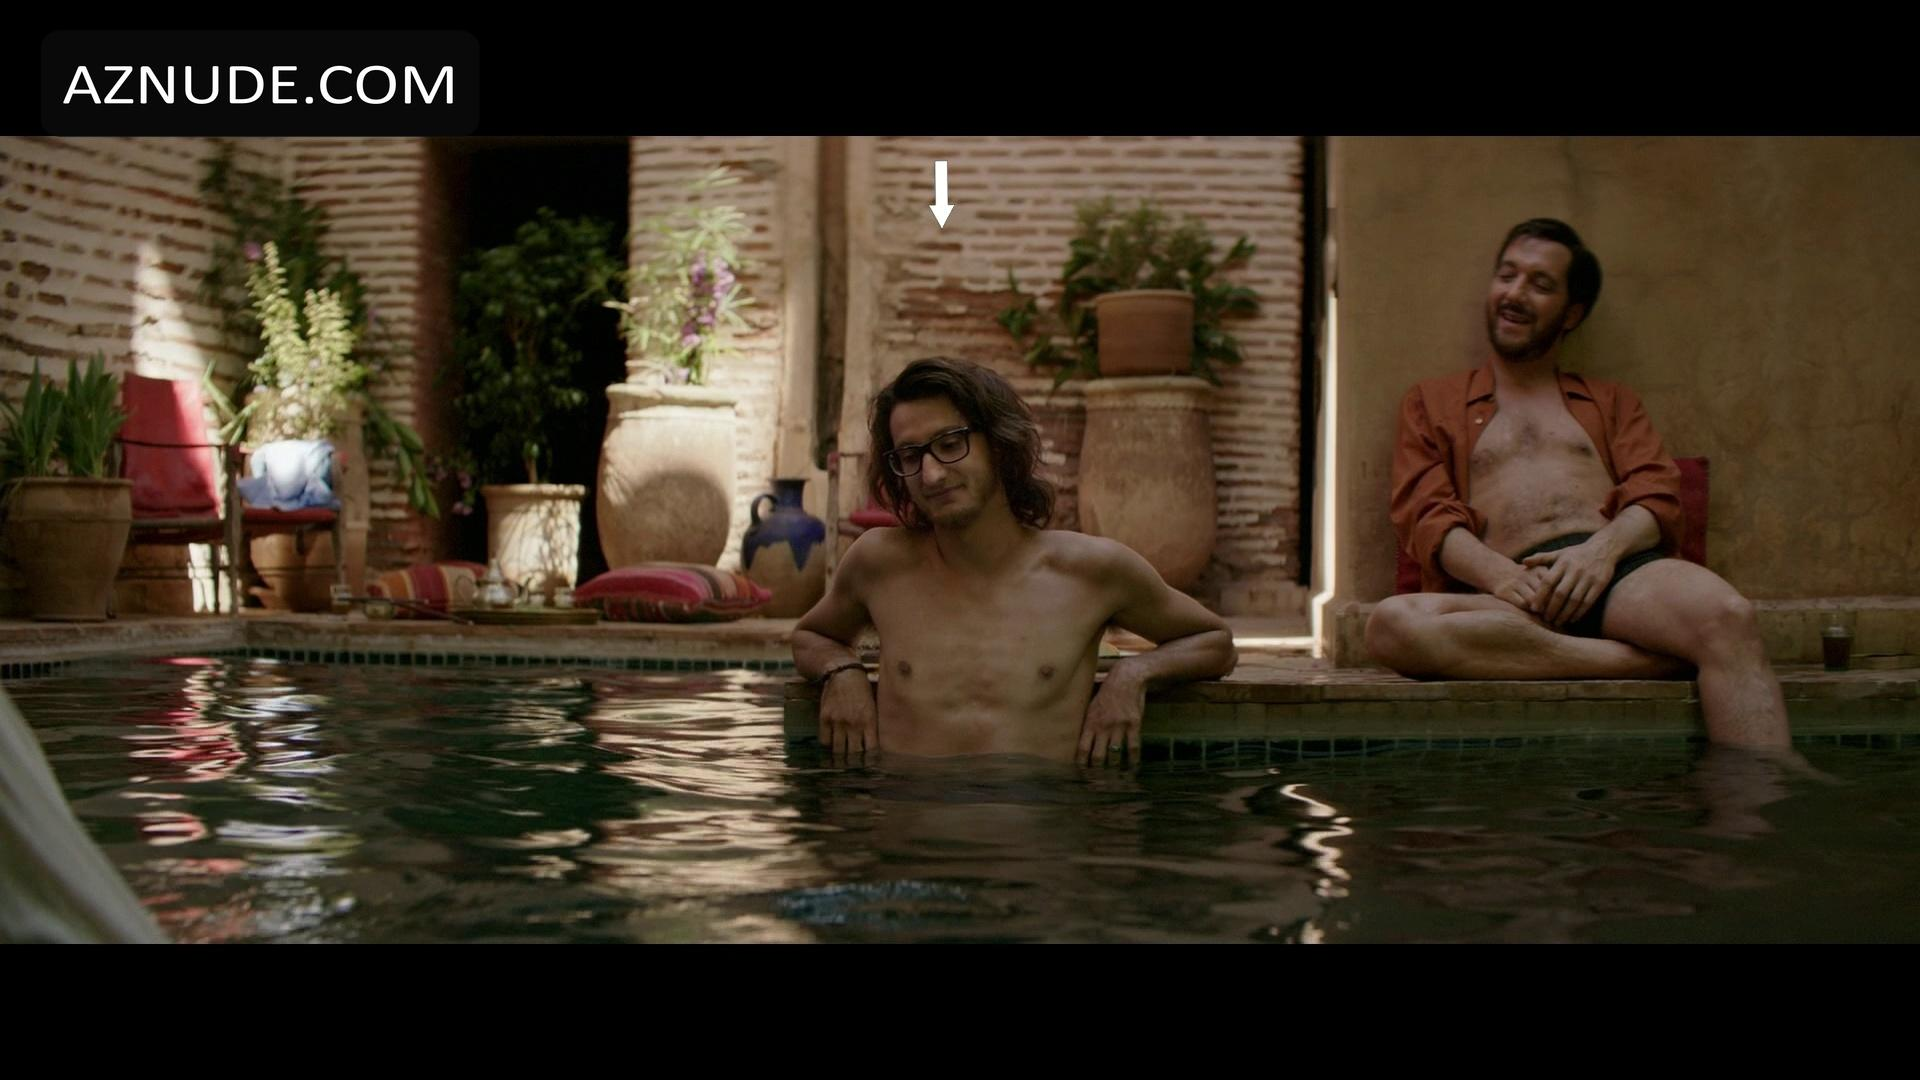 Swimsuit Yves Saint Laurent Nude Photos